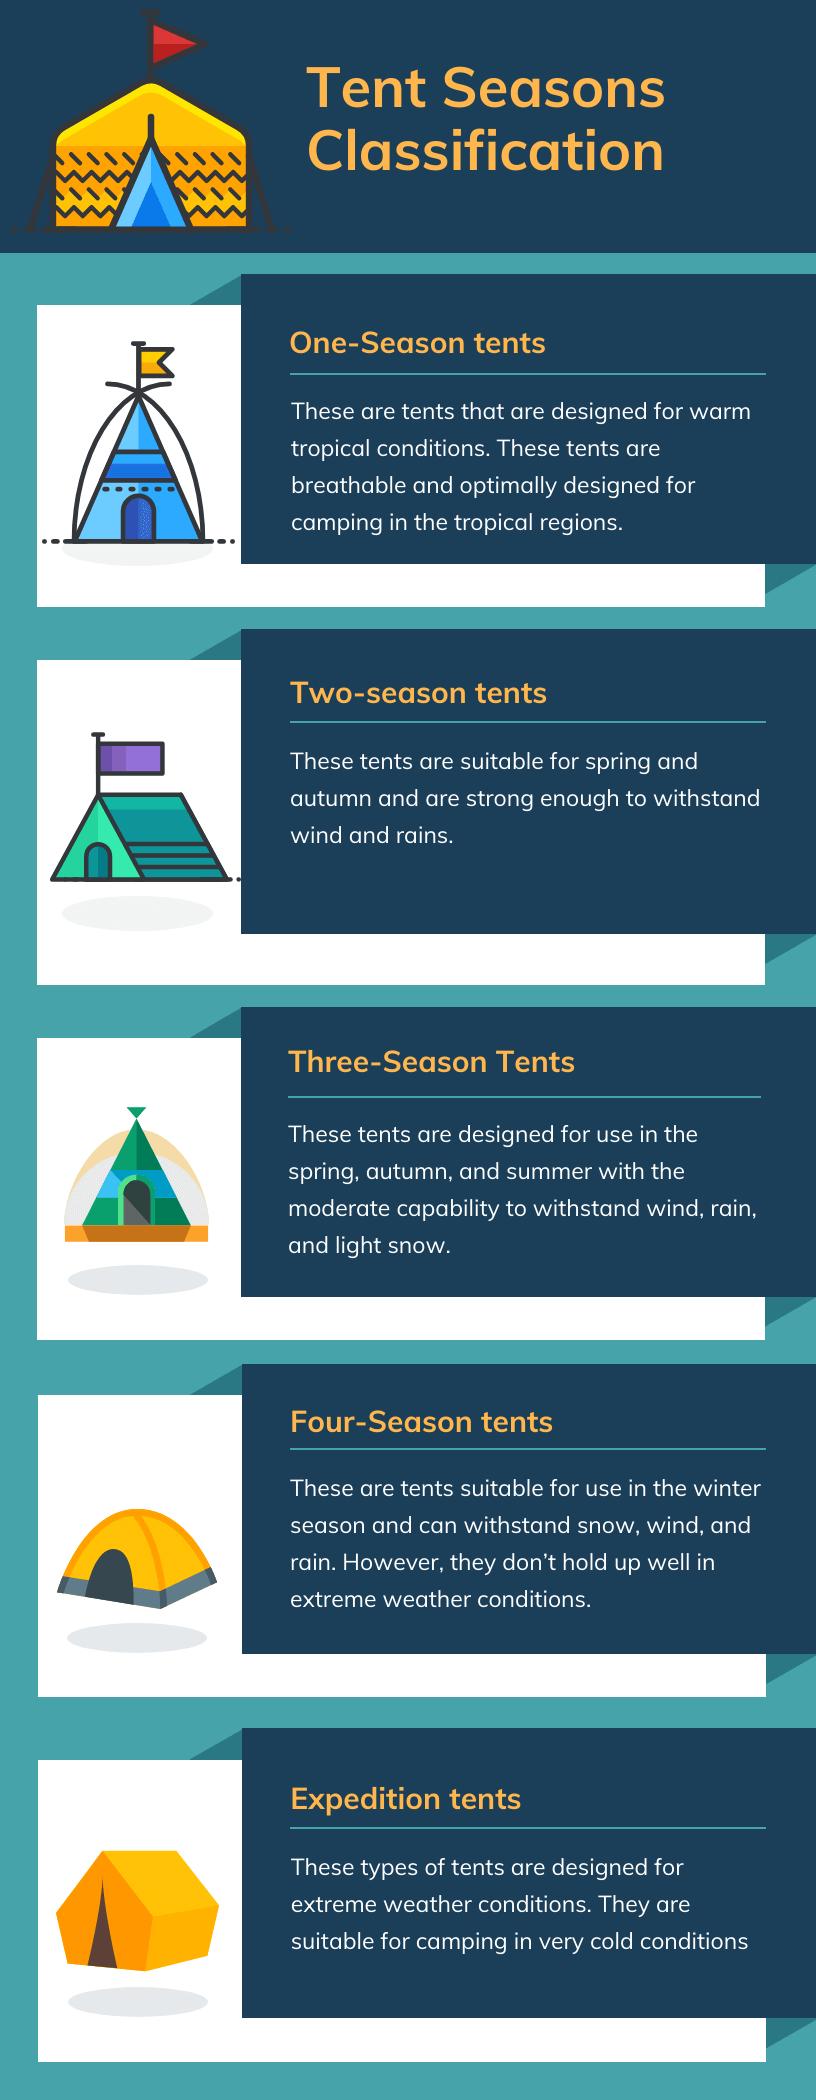 Tent Seasons Classification